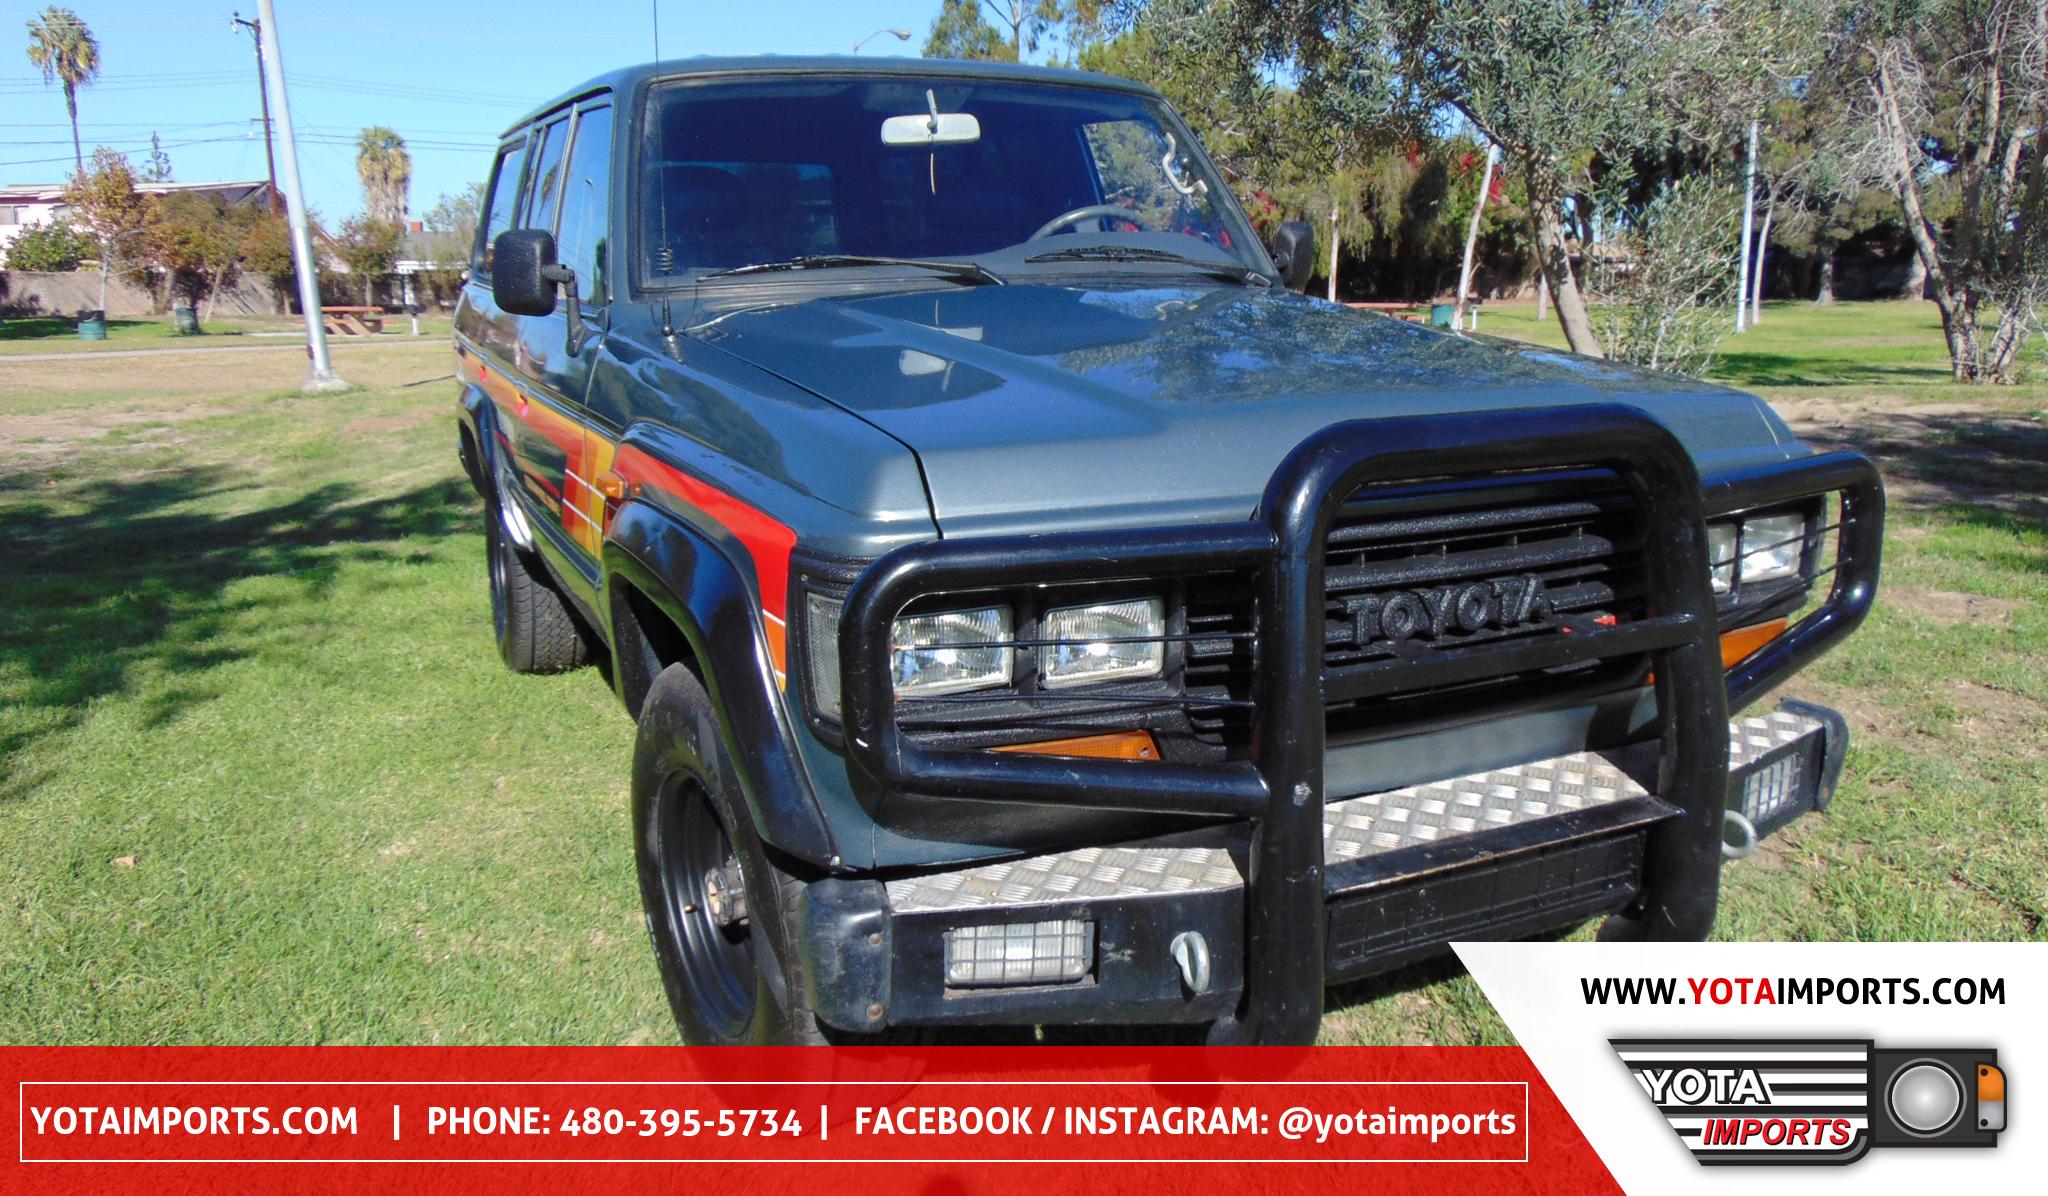 1988 Toyota Land Cruiser Hj61 020161201a Yota Imports